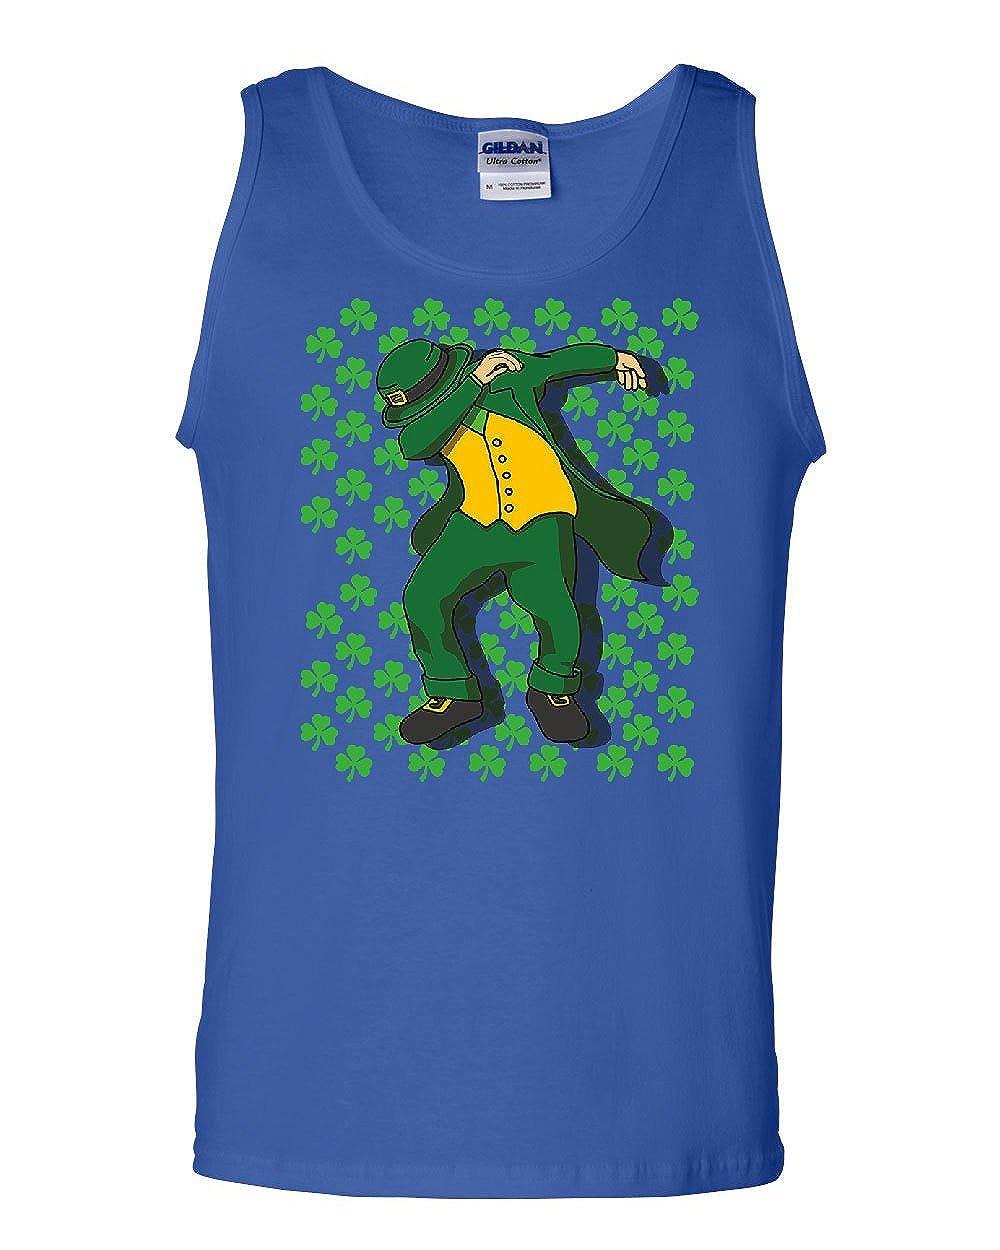 Tee Hunt ST Patricks Day DAB Tank Top Shamrock Dancing Leprechaun Beer Sleeveless